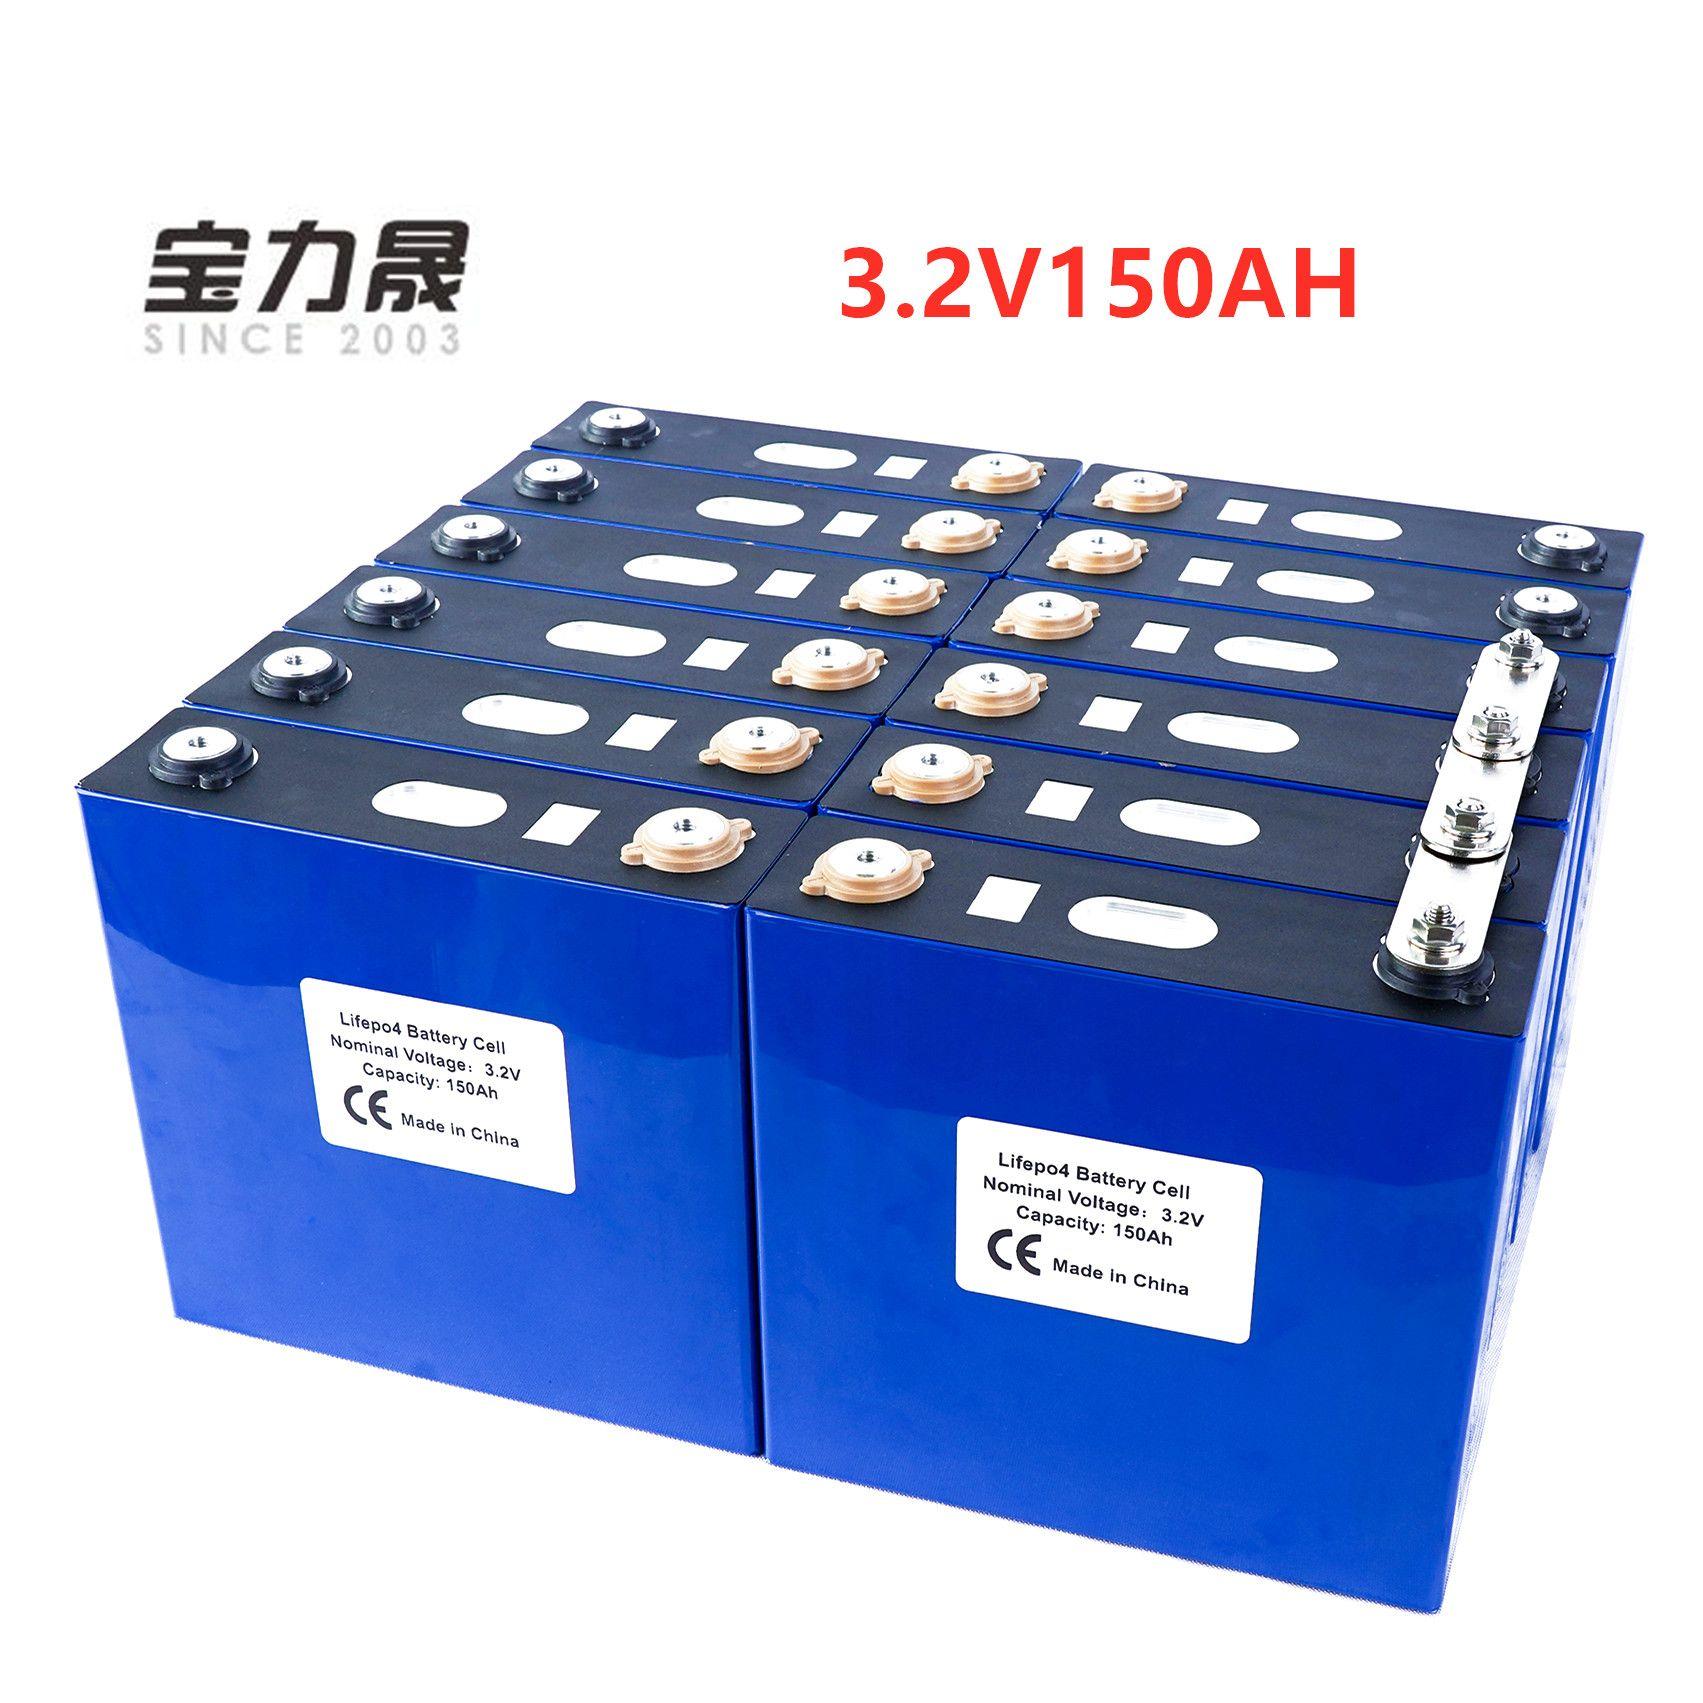 2019 NEUE 16PCS 3,2 V 150Ah Lithium-Eisen Phosphat Zelle lifepo4 batterie solar 24V300AH 48V150Ah zellen nicht 120Ah EU UNS STEUER FREIES